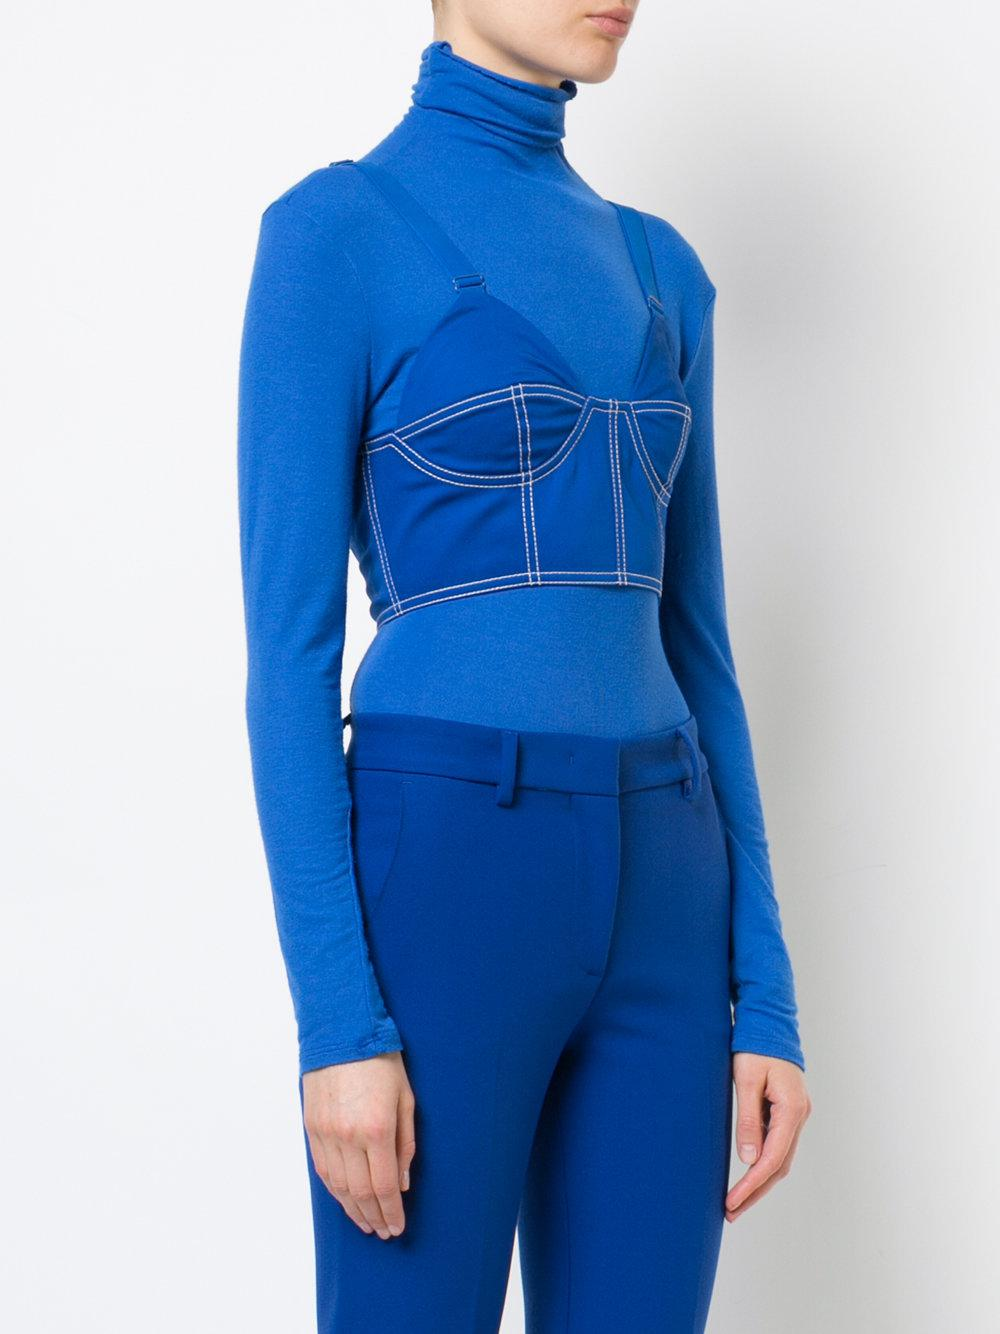 6cb80b7d65b94 Givenchy - Blue Workwear Bra - Lyst. View fullscreen